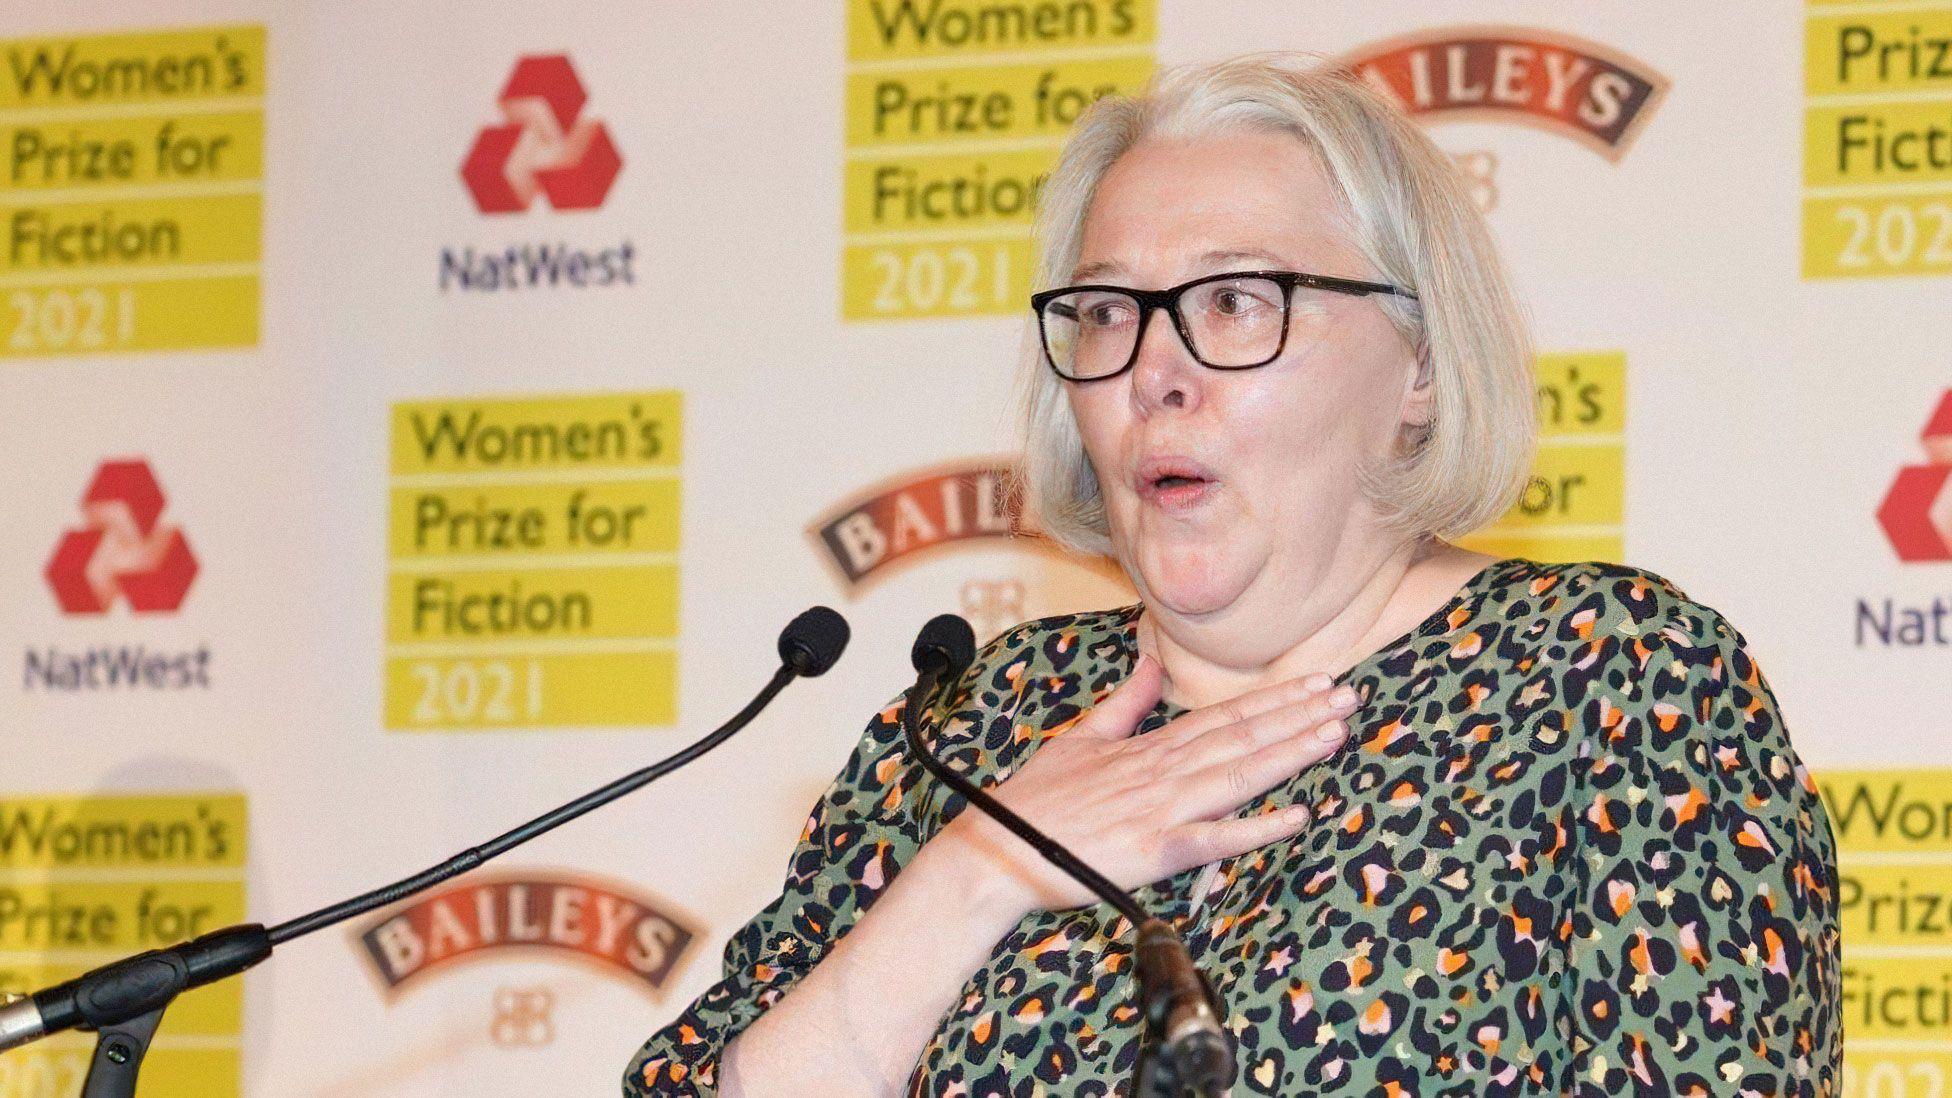 Сюзанна Кларк нацеремонии вручения премии Women's Prize for Fiction. Фото: BBC